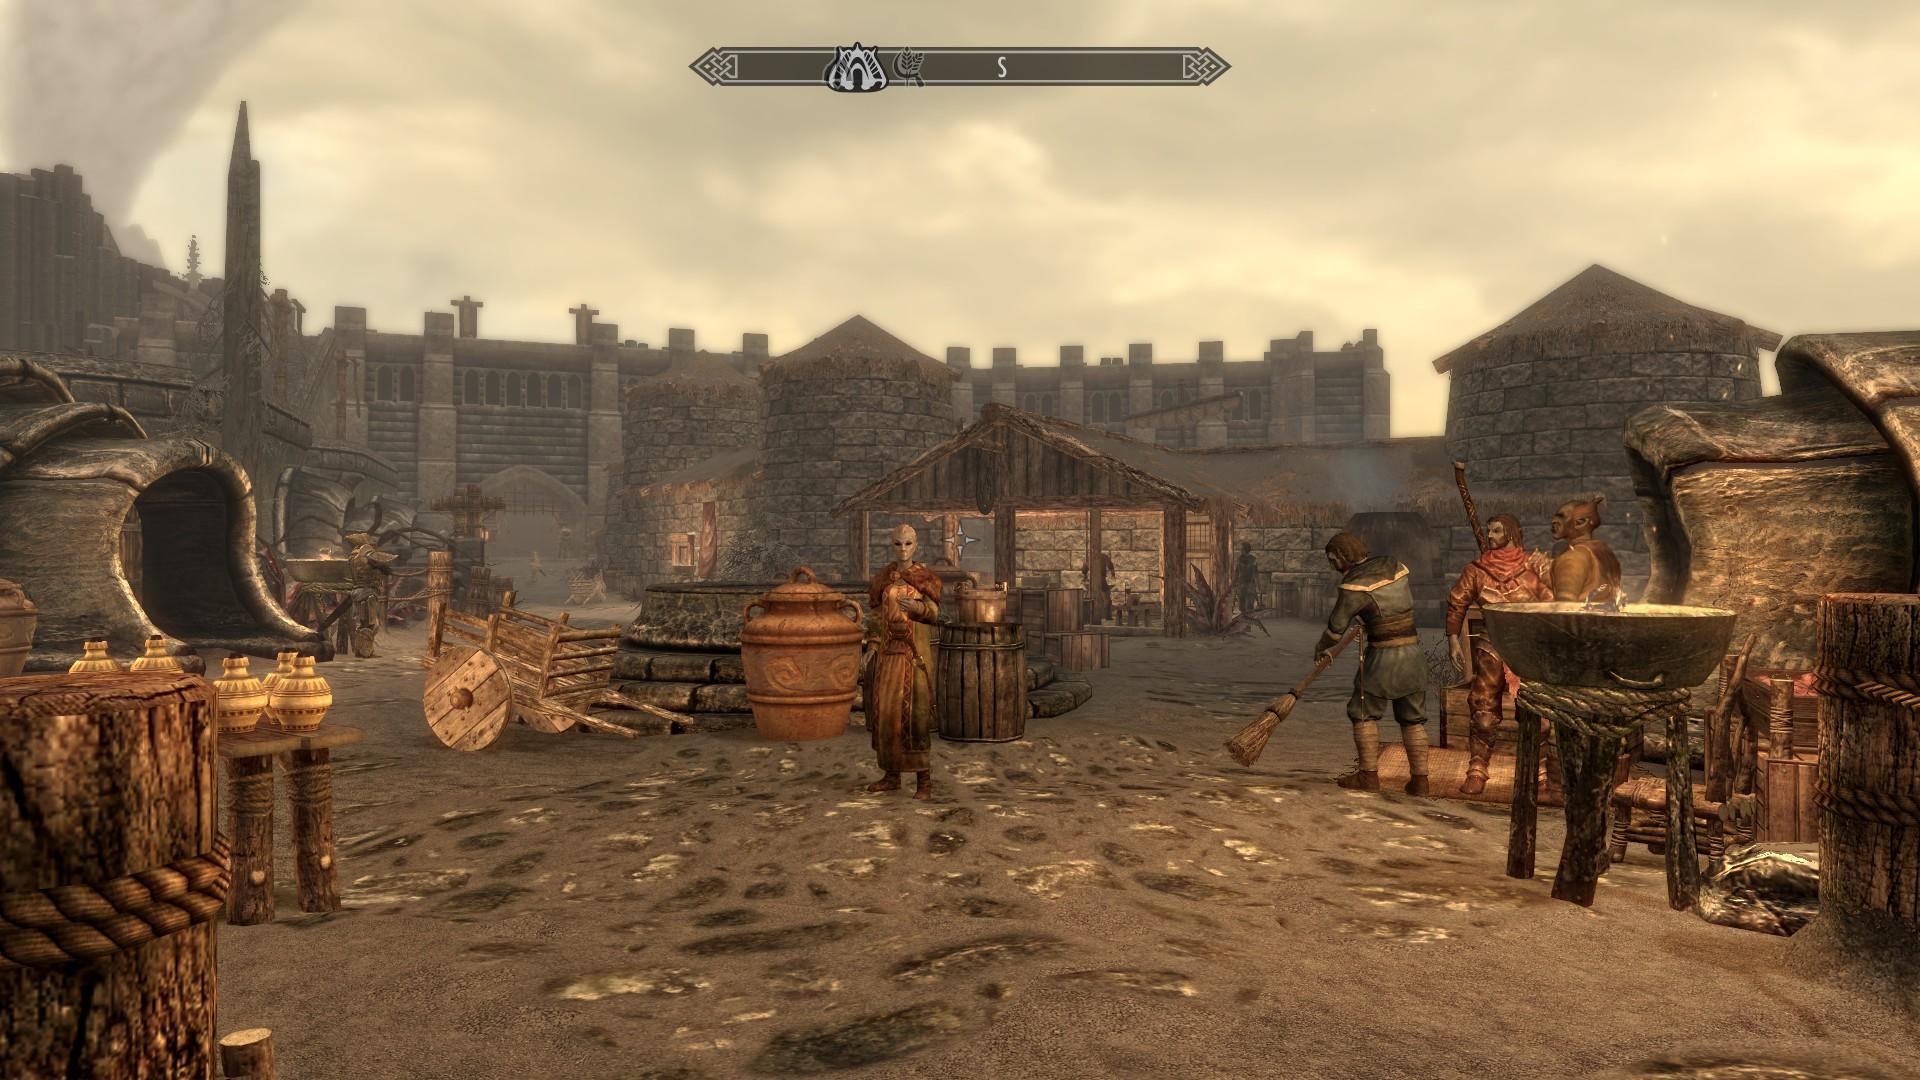 dragonborn-skyrim-dlc-001-rabenfels